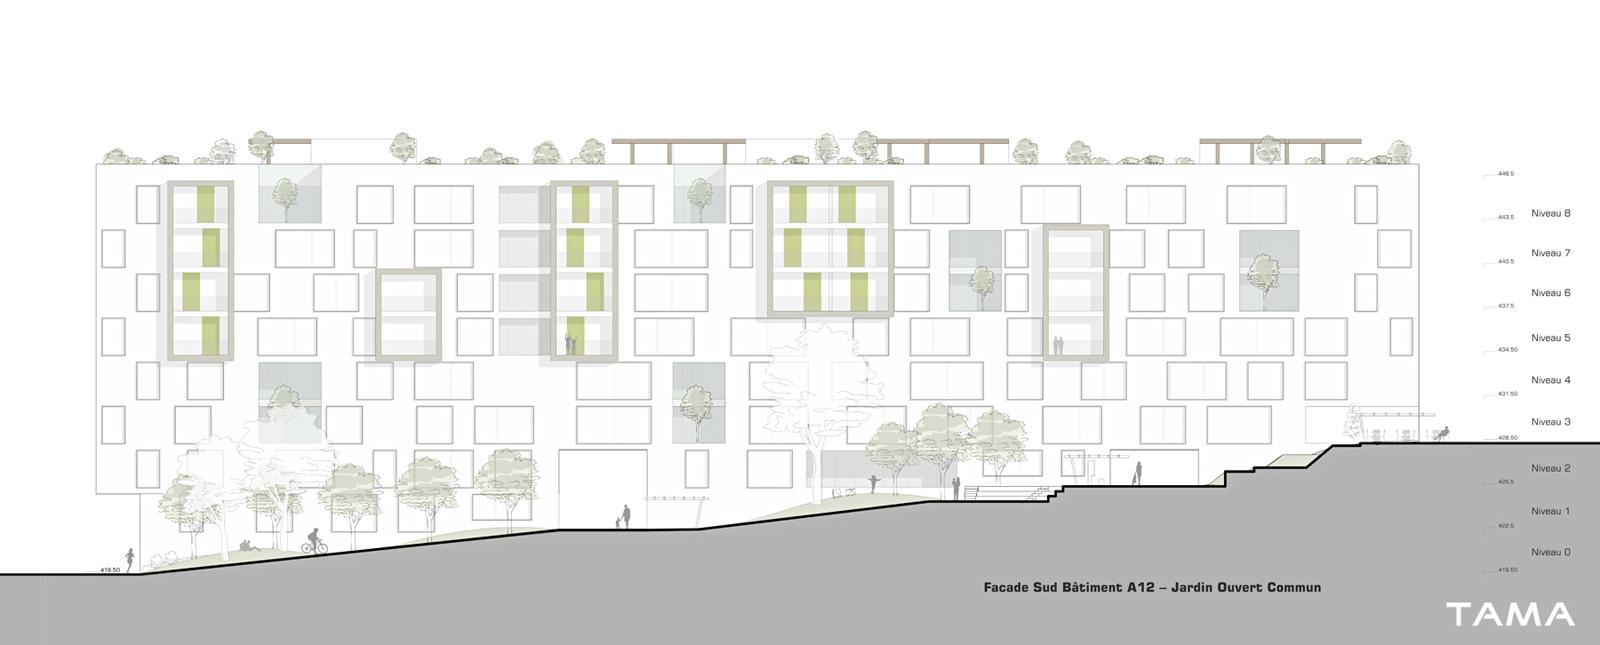 façade Sud typologie 5.5 piéces